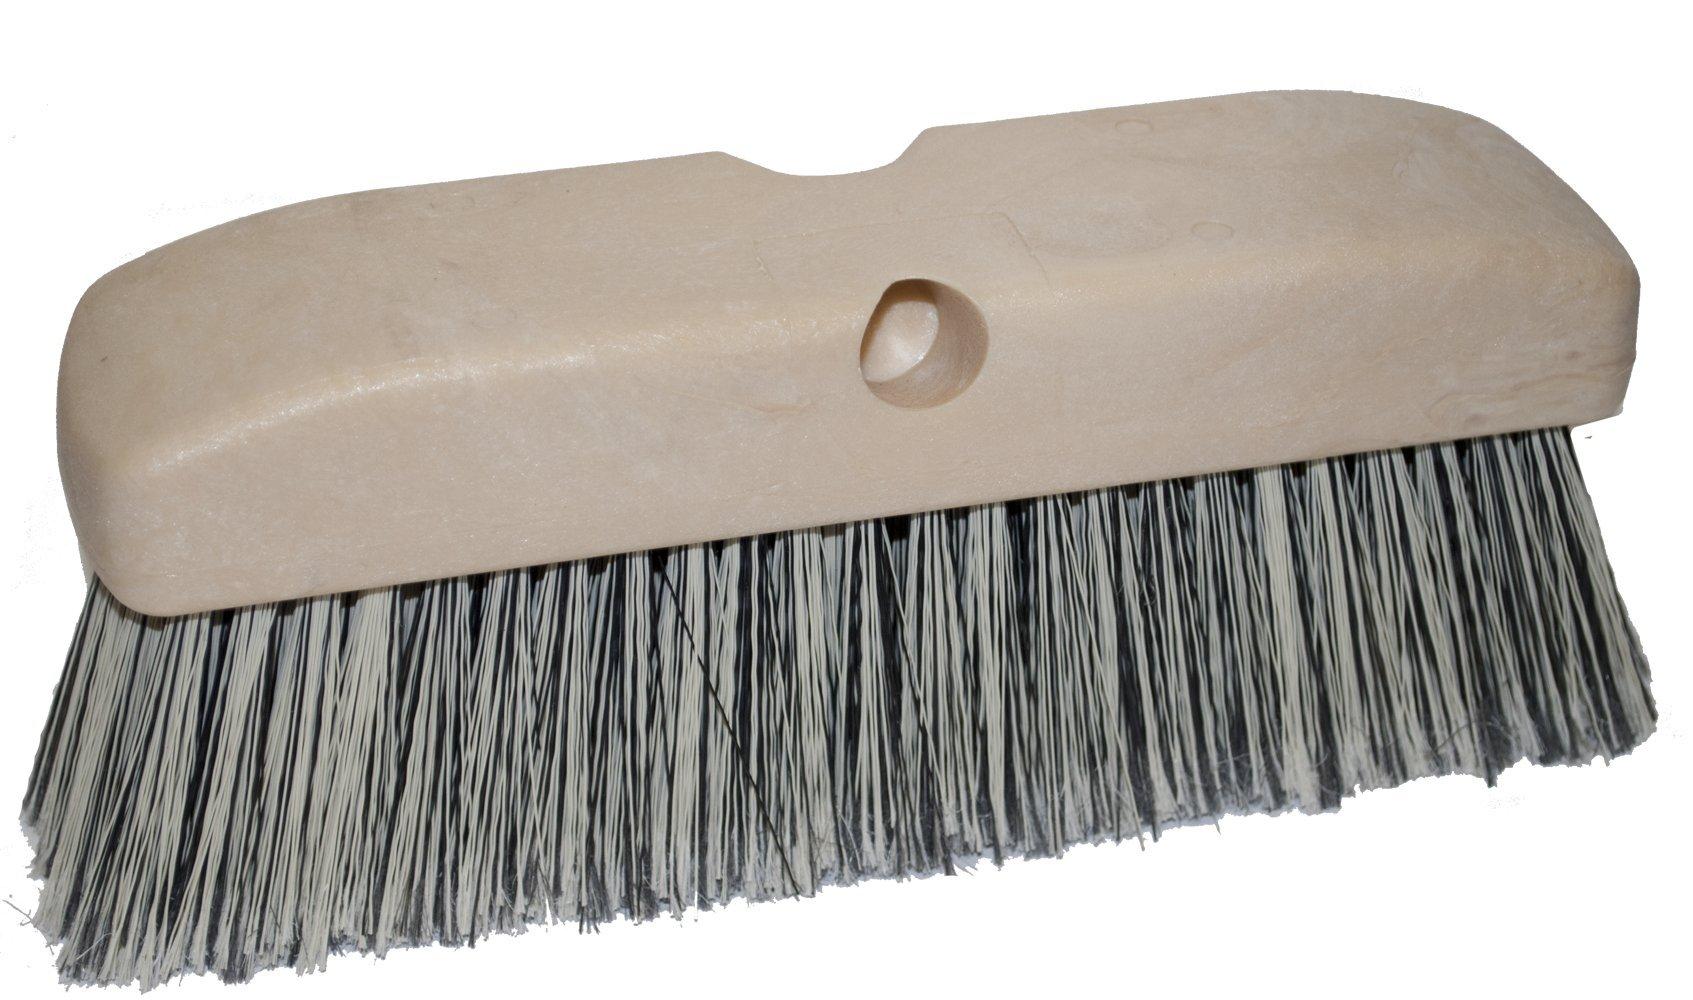 Magnolia Brush 3040 Vehicle Wash Brush, Polystyrene Bristles, 2-1/2'' Trim, 10'' Length, Black/White (Case of 12)